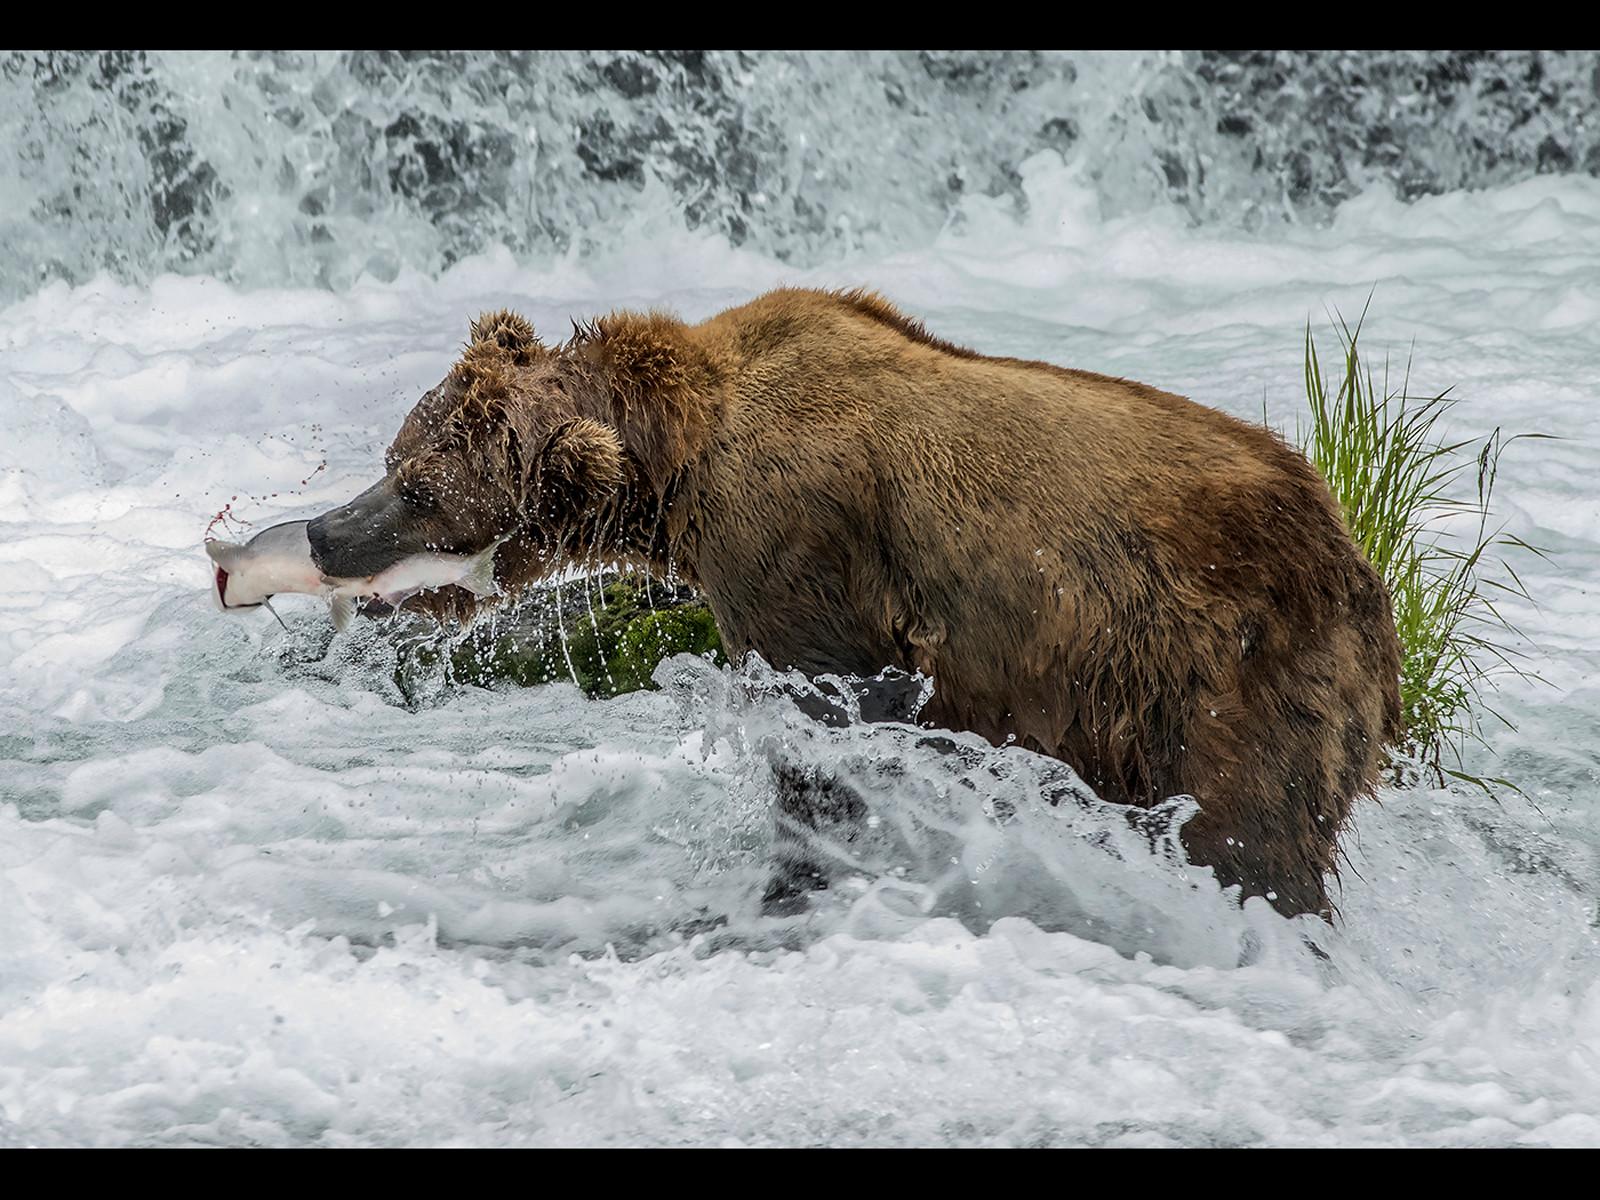 PDI - Bear with Salmon by Chris Blyth (17 marks)